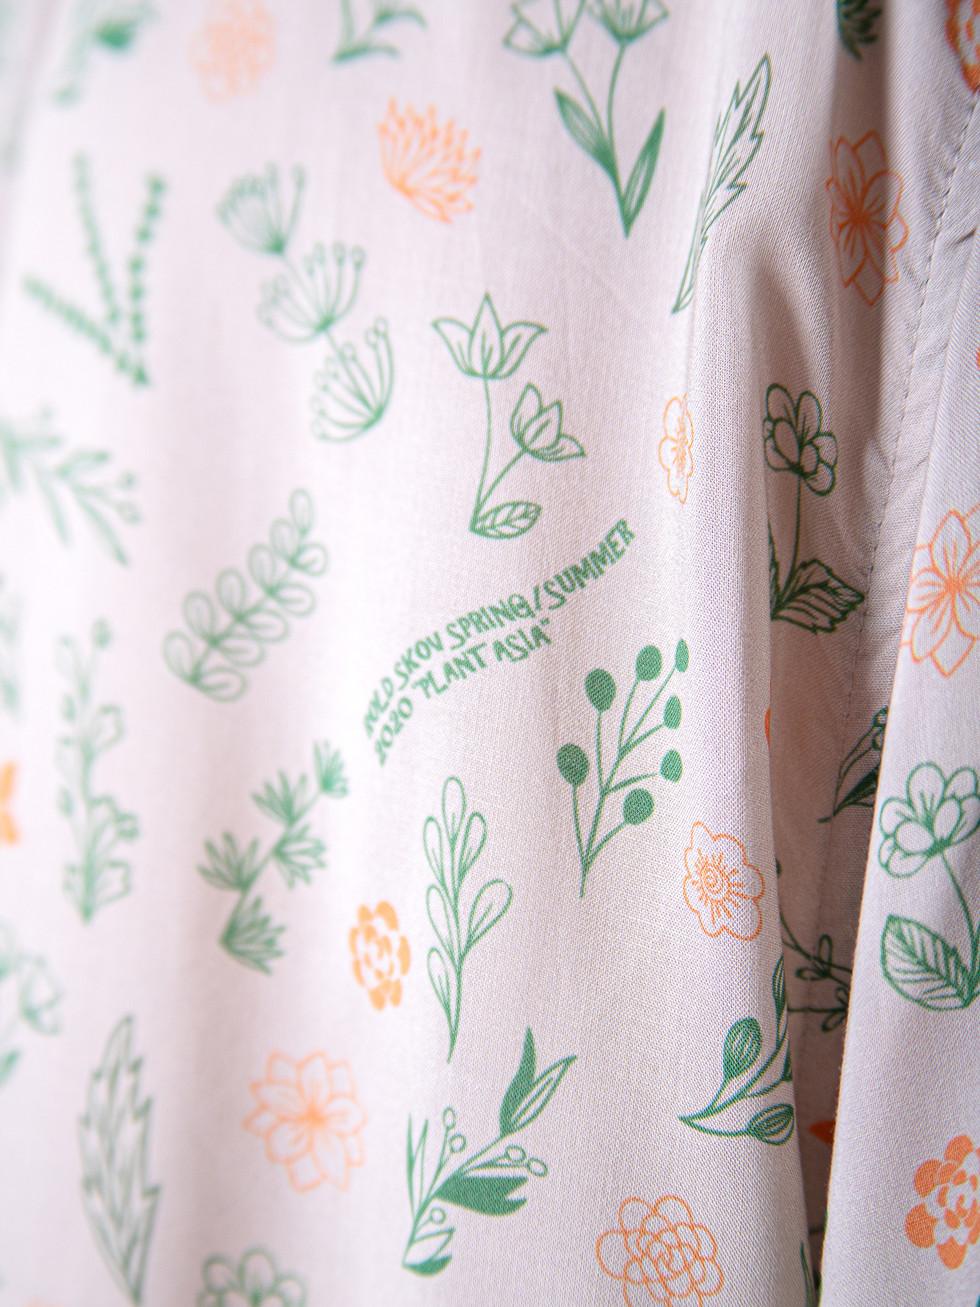 09_rold_skov_ss20_plantasia_shirt-12.jpg